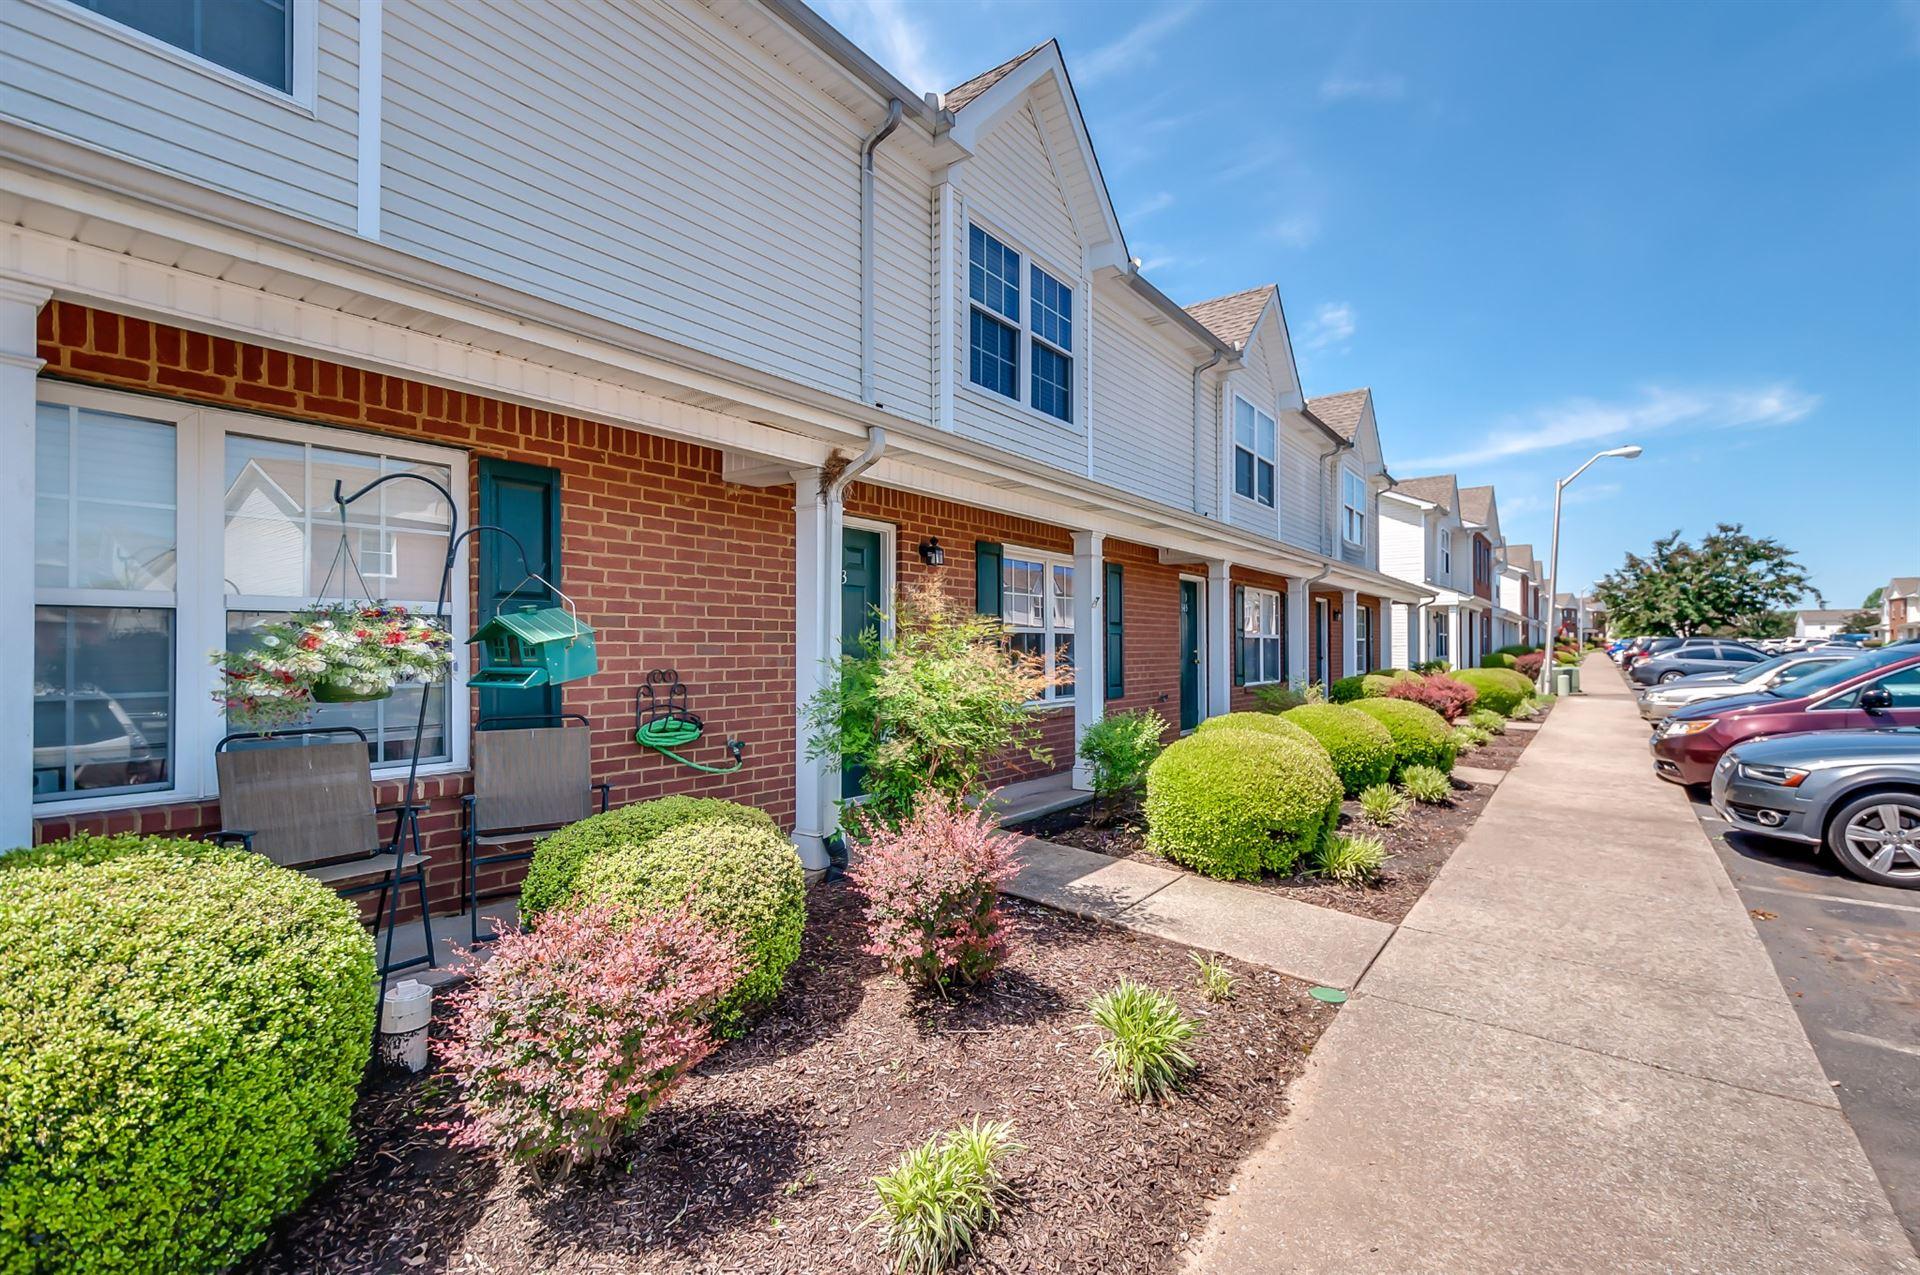 343 Shoshone Pl, Murfreesboro, TN 37128 - MLS#: 2252848